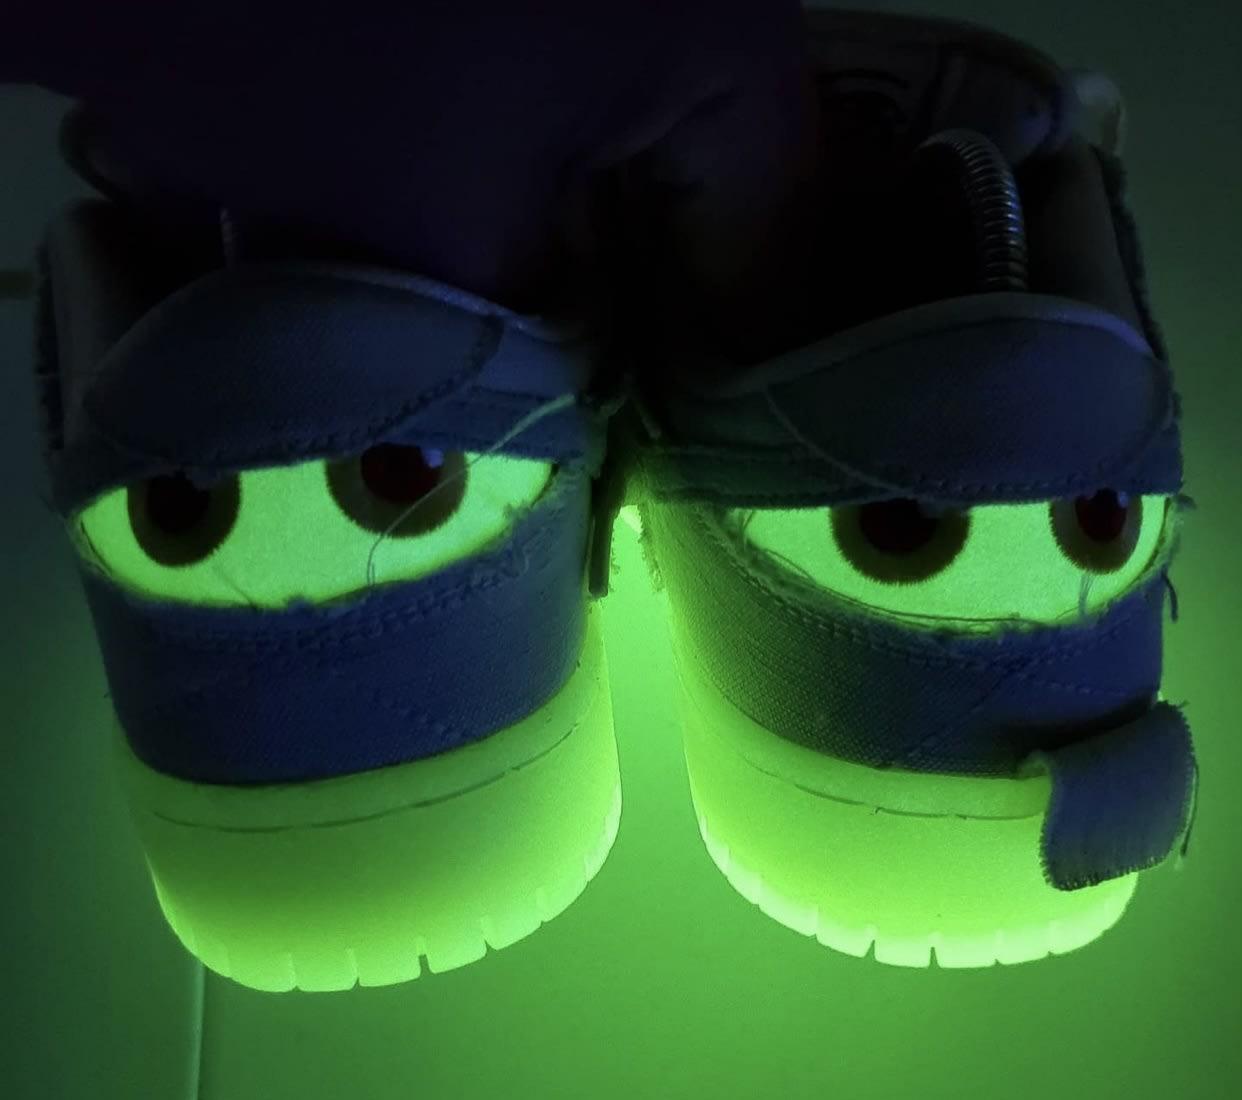 Nike SB Dunk Low Mummy Halloween DM0774-111 Glow Sole Dark